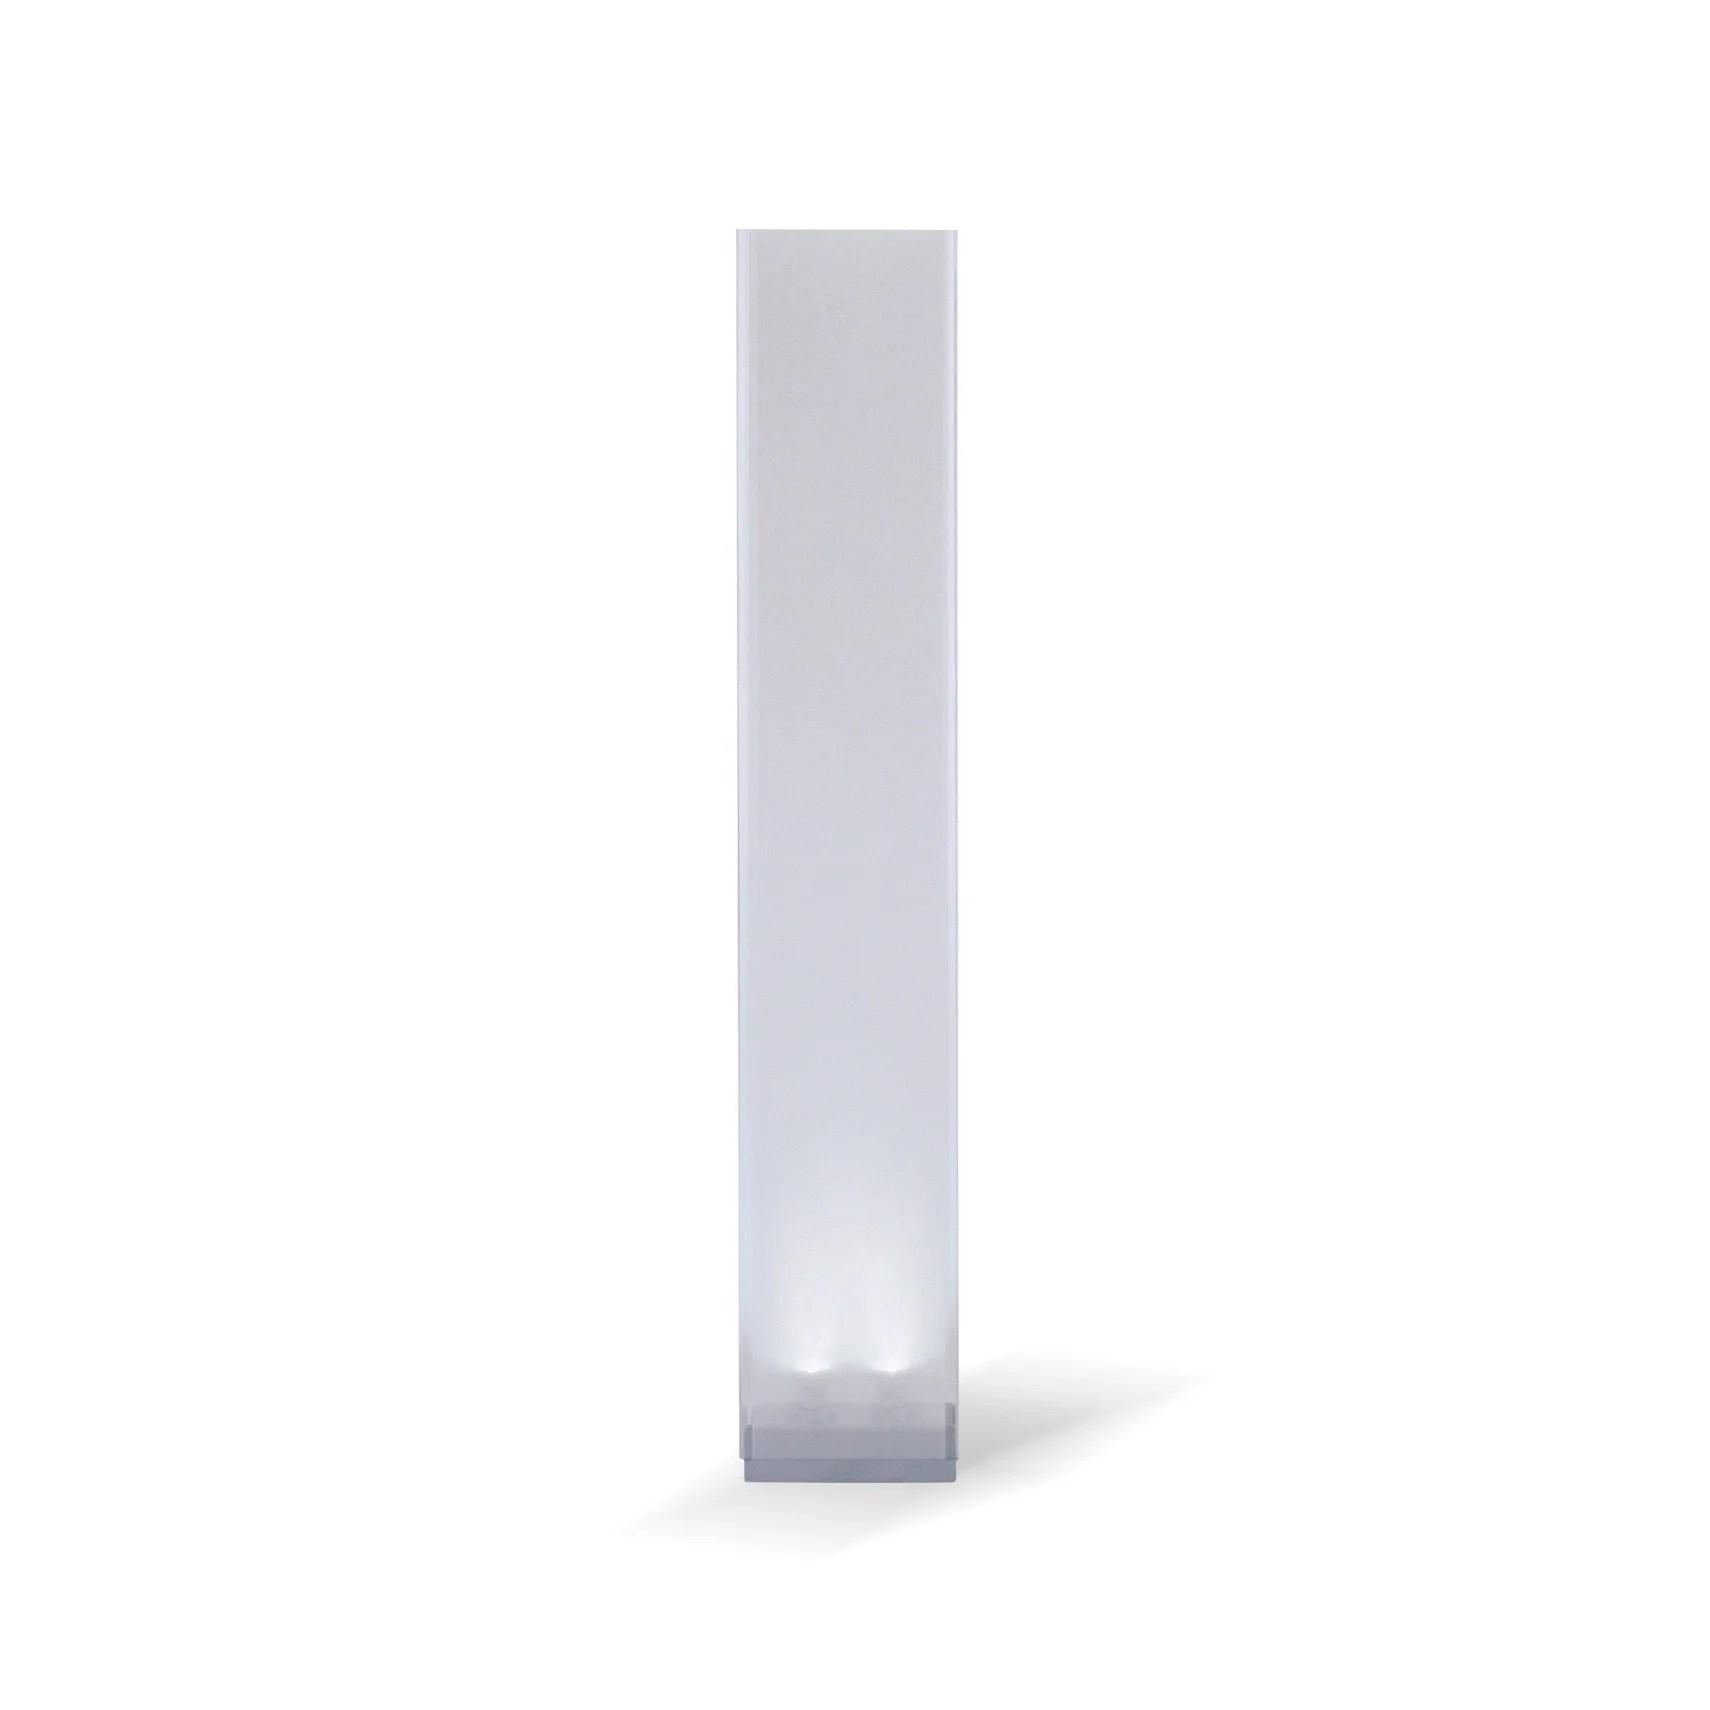 Pablo Designs Cortina Table Lamp  Reviews  Wayfair